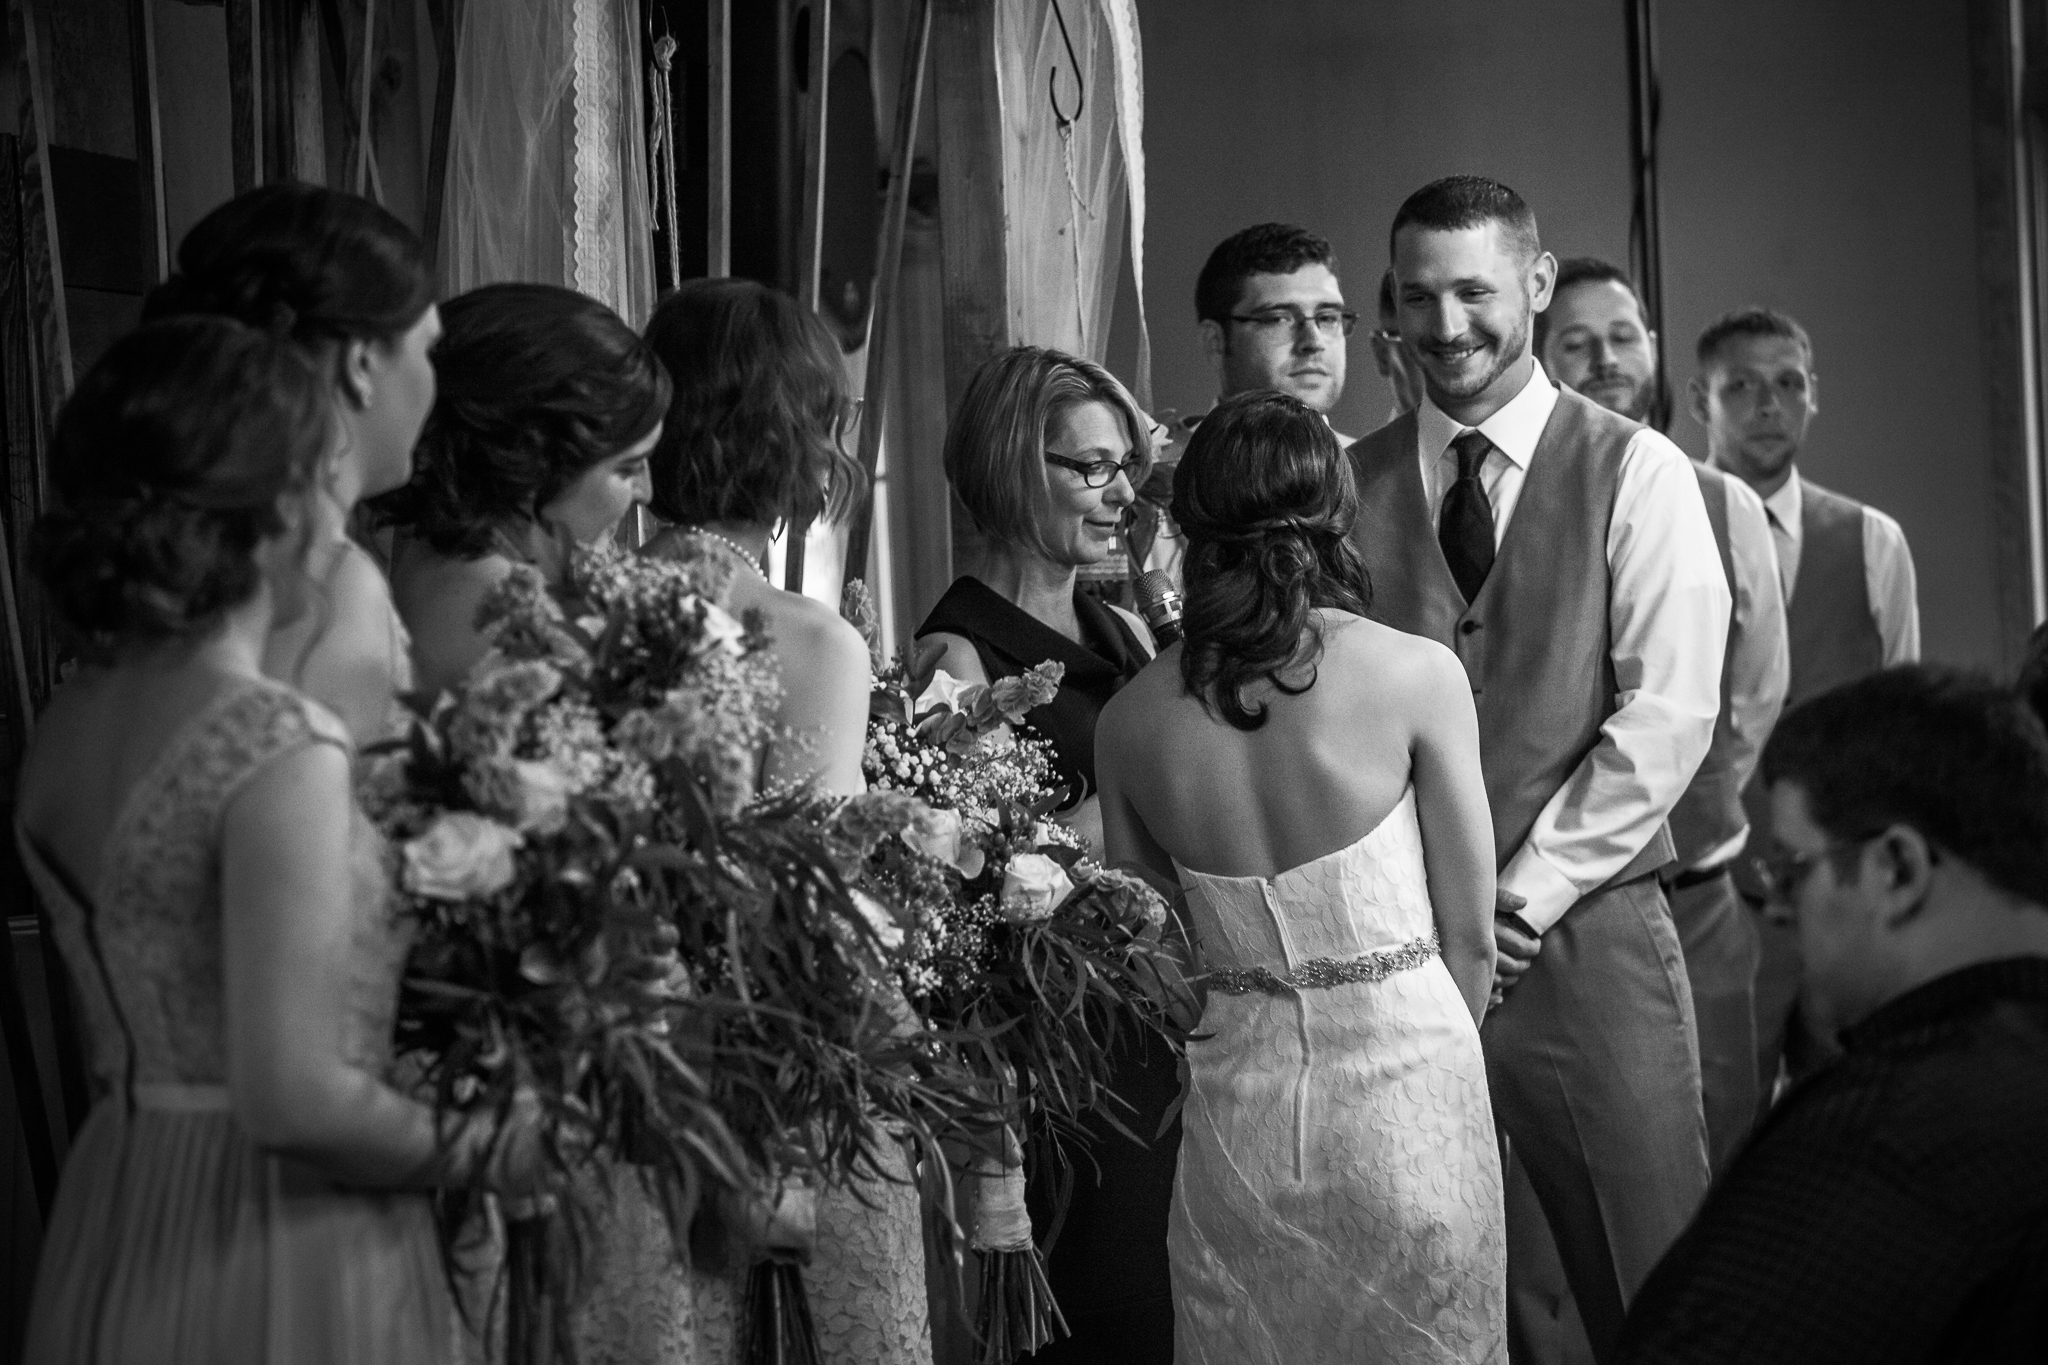 Portage WI wedding photographer